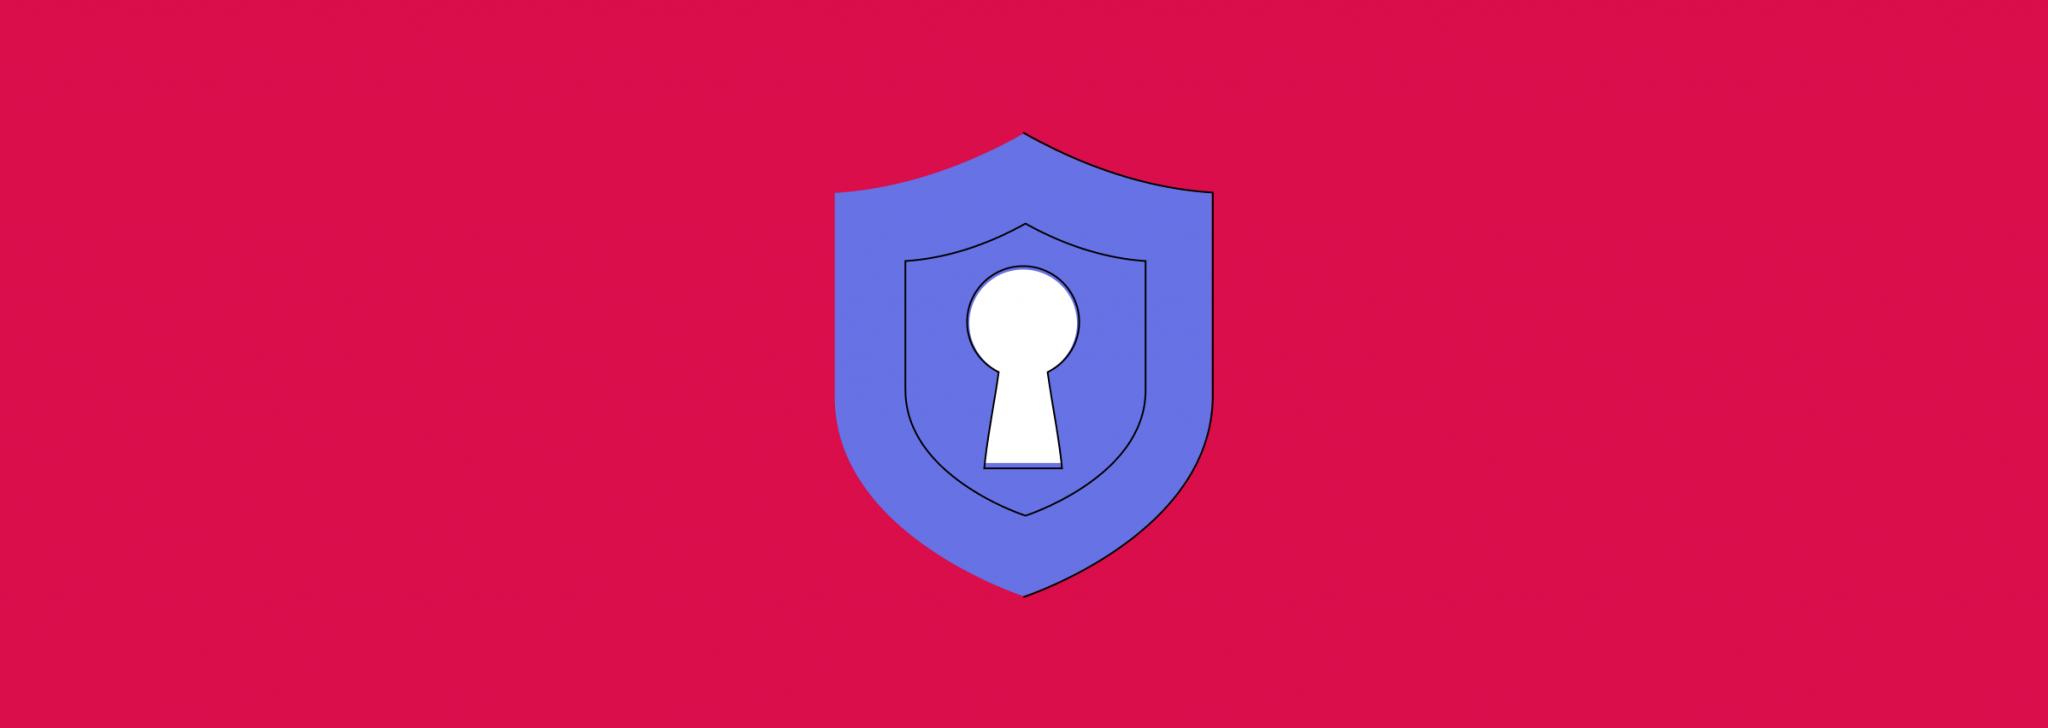 Datenschutzgesetze